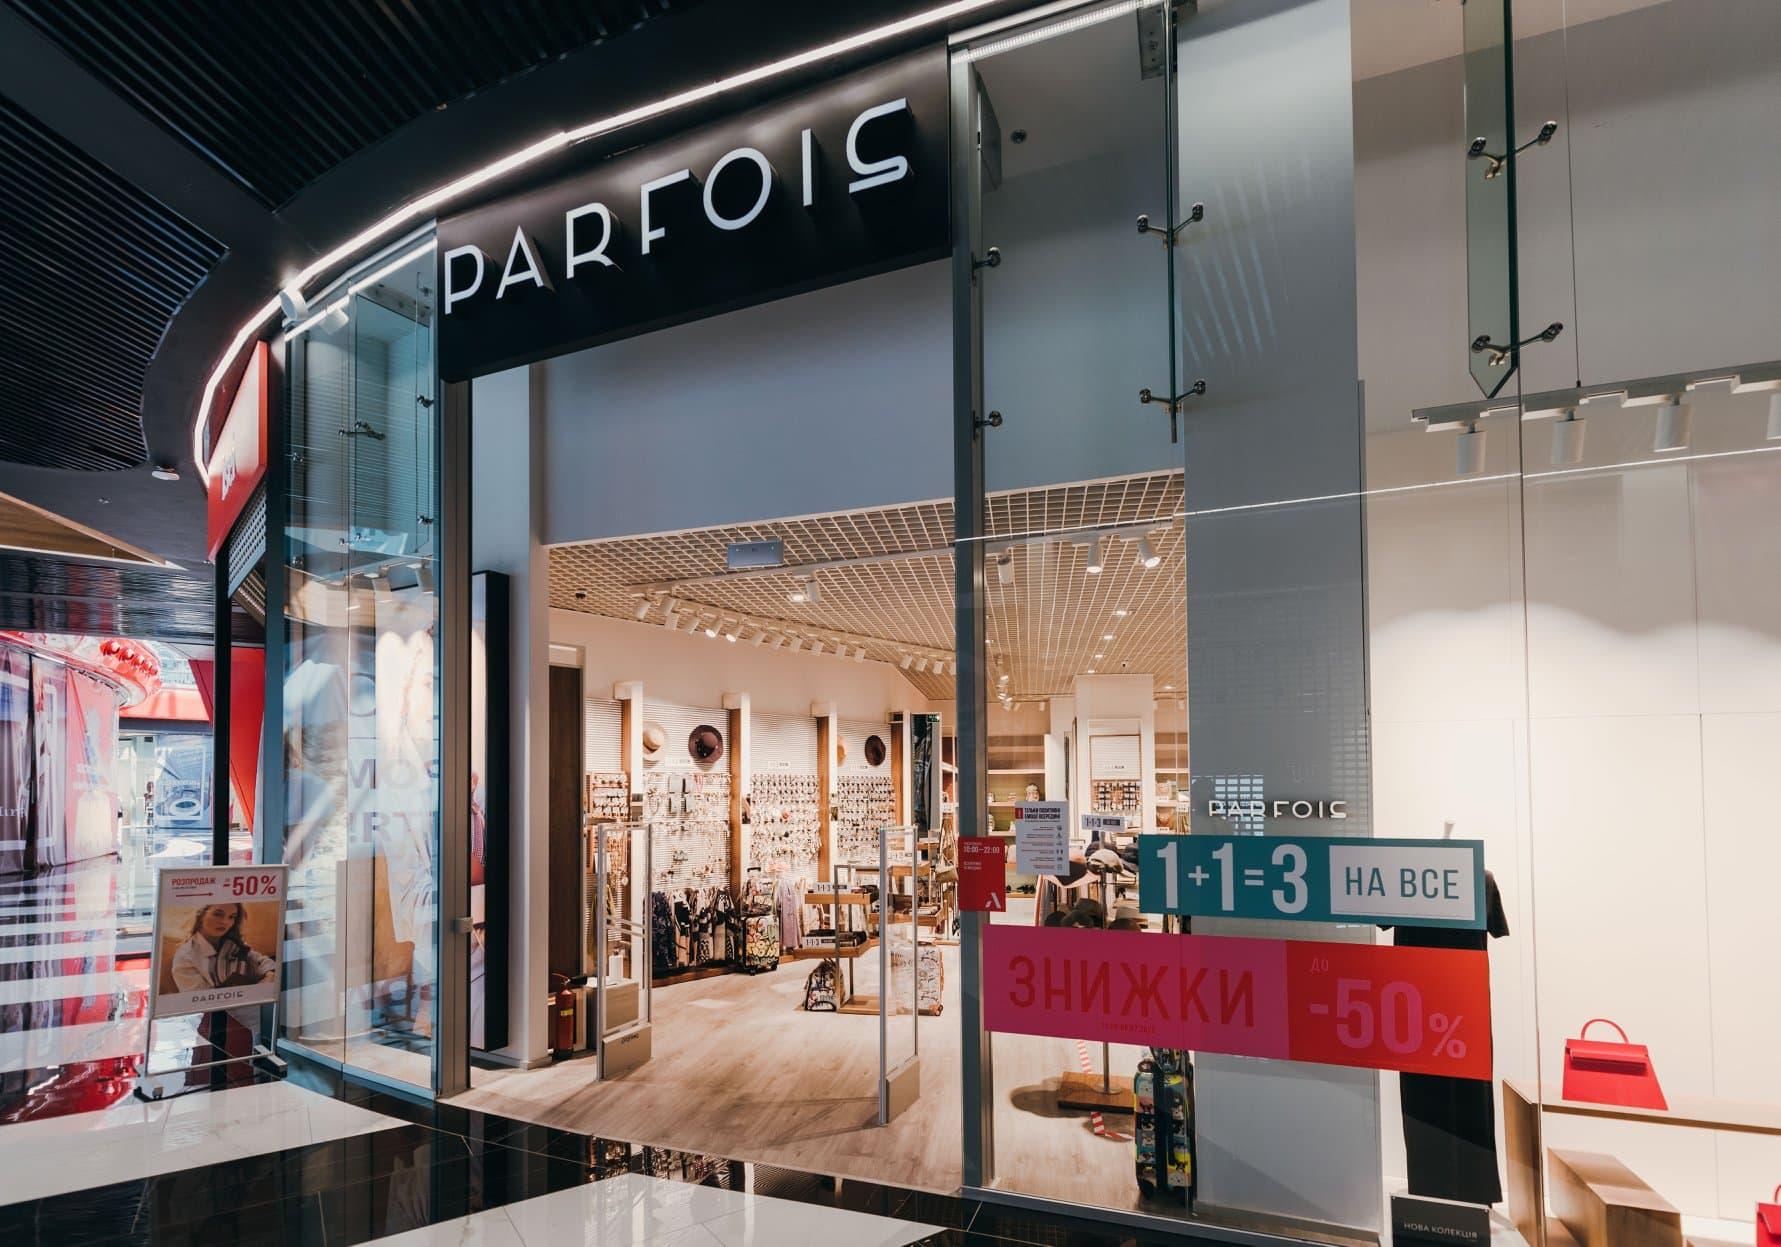 Portuguese brand PARFOIS opens at Blockbuster Mall